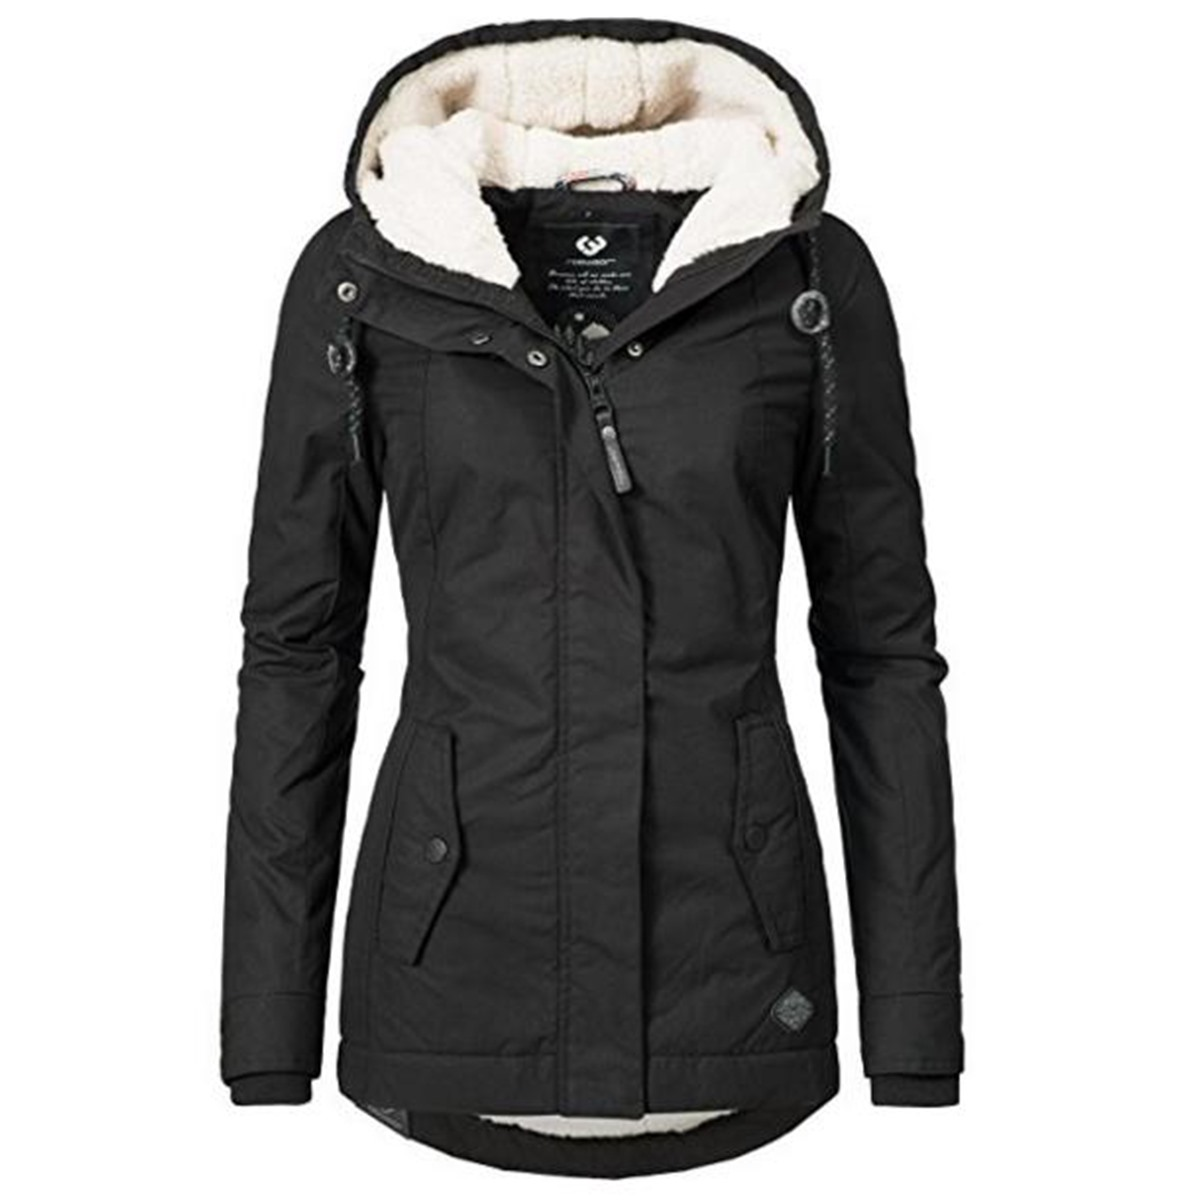 Bohoartist Black Cotton Hooded Coats Women Jacket Coat Fashion Slim Winter Warm Zipper Pocket Thicken Casual Hot Basic Overcoat